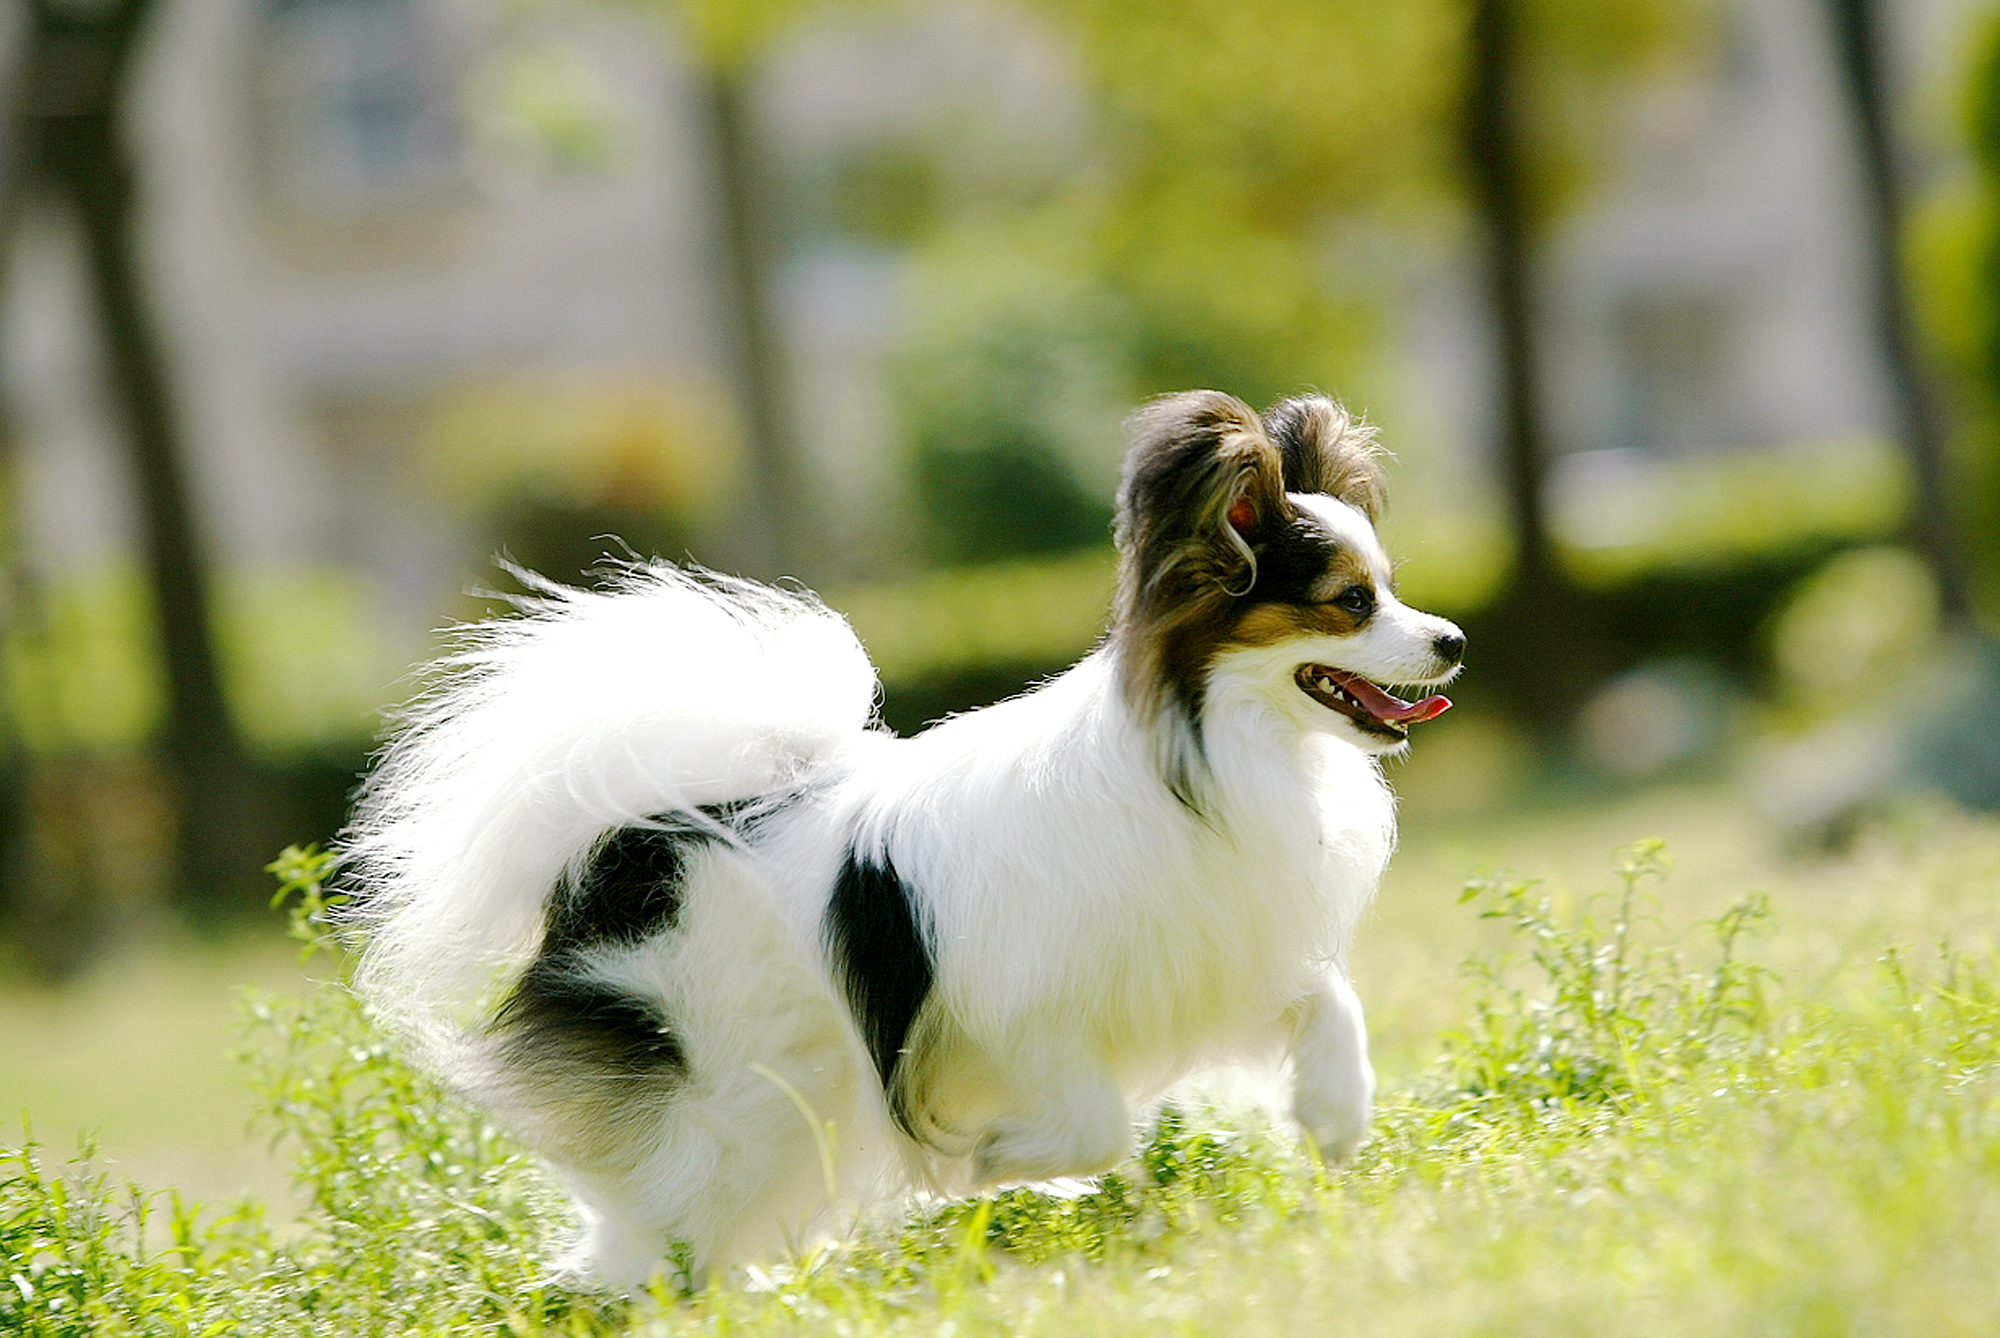 dog0025-018.jpg